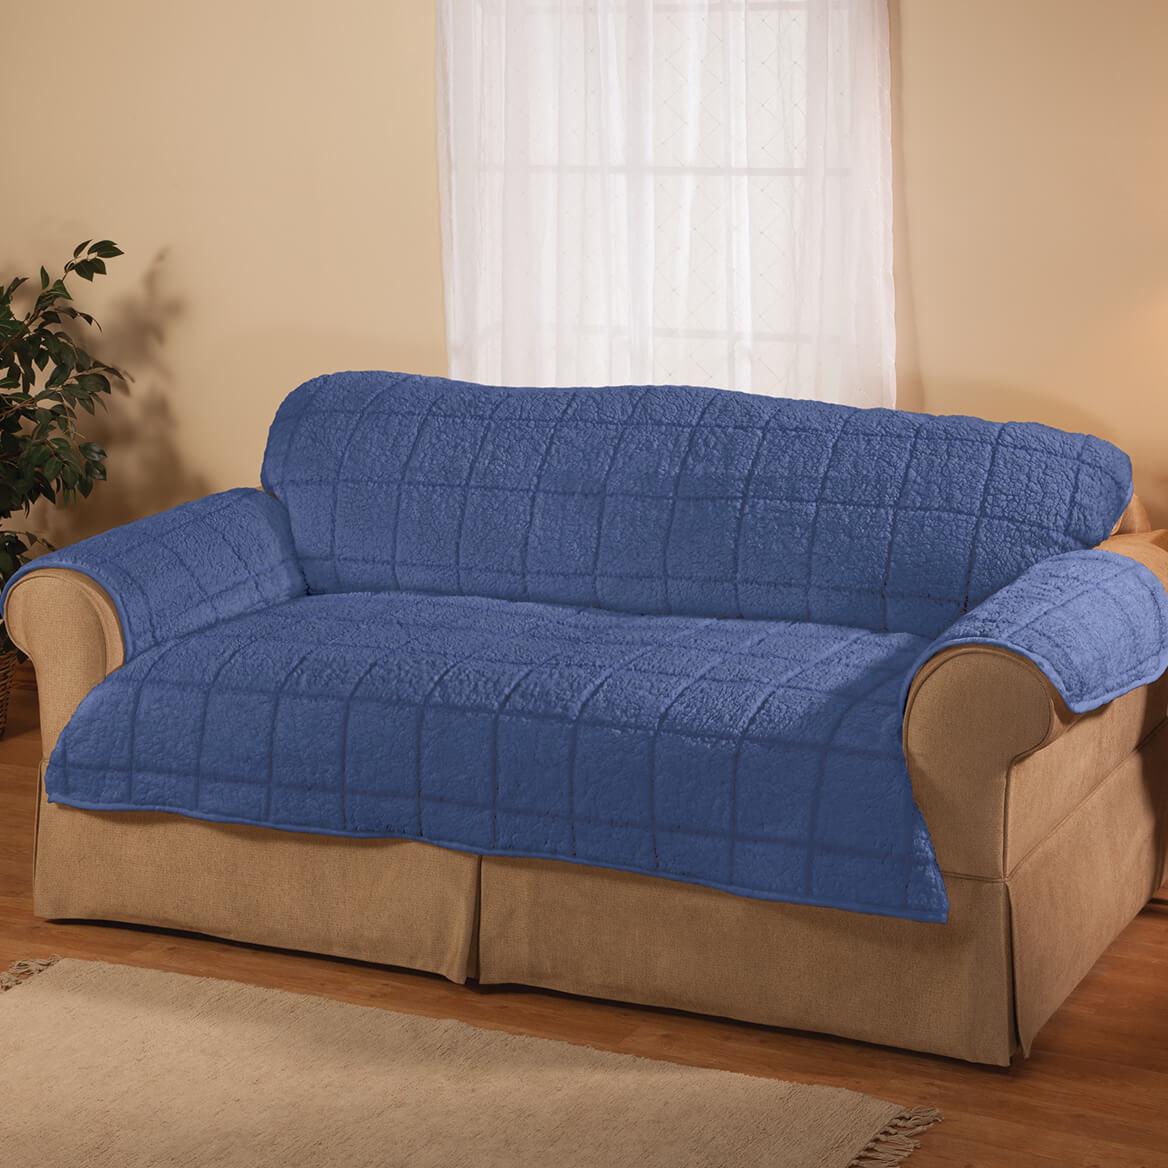 Bradley Sherpa Sofa Protector by OakRidge-362643